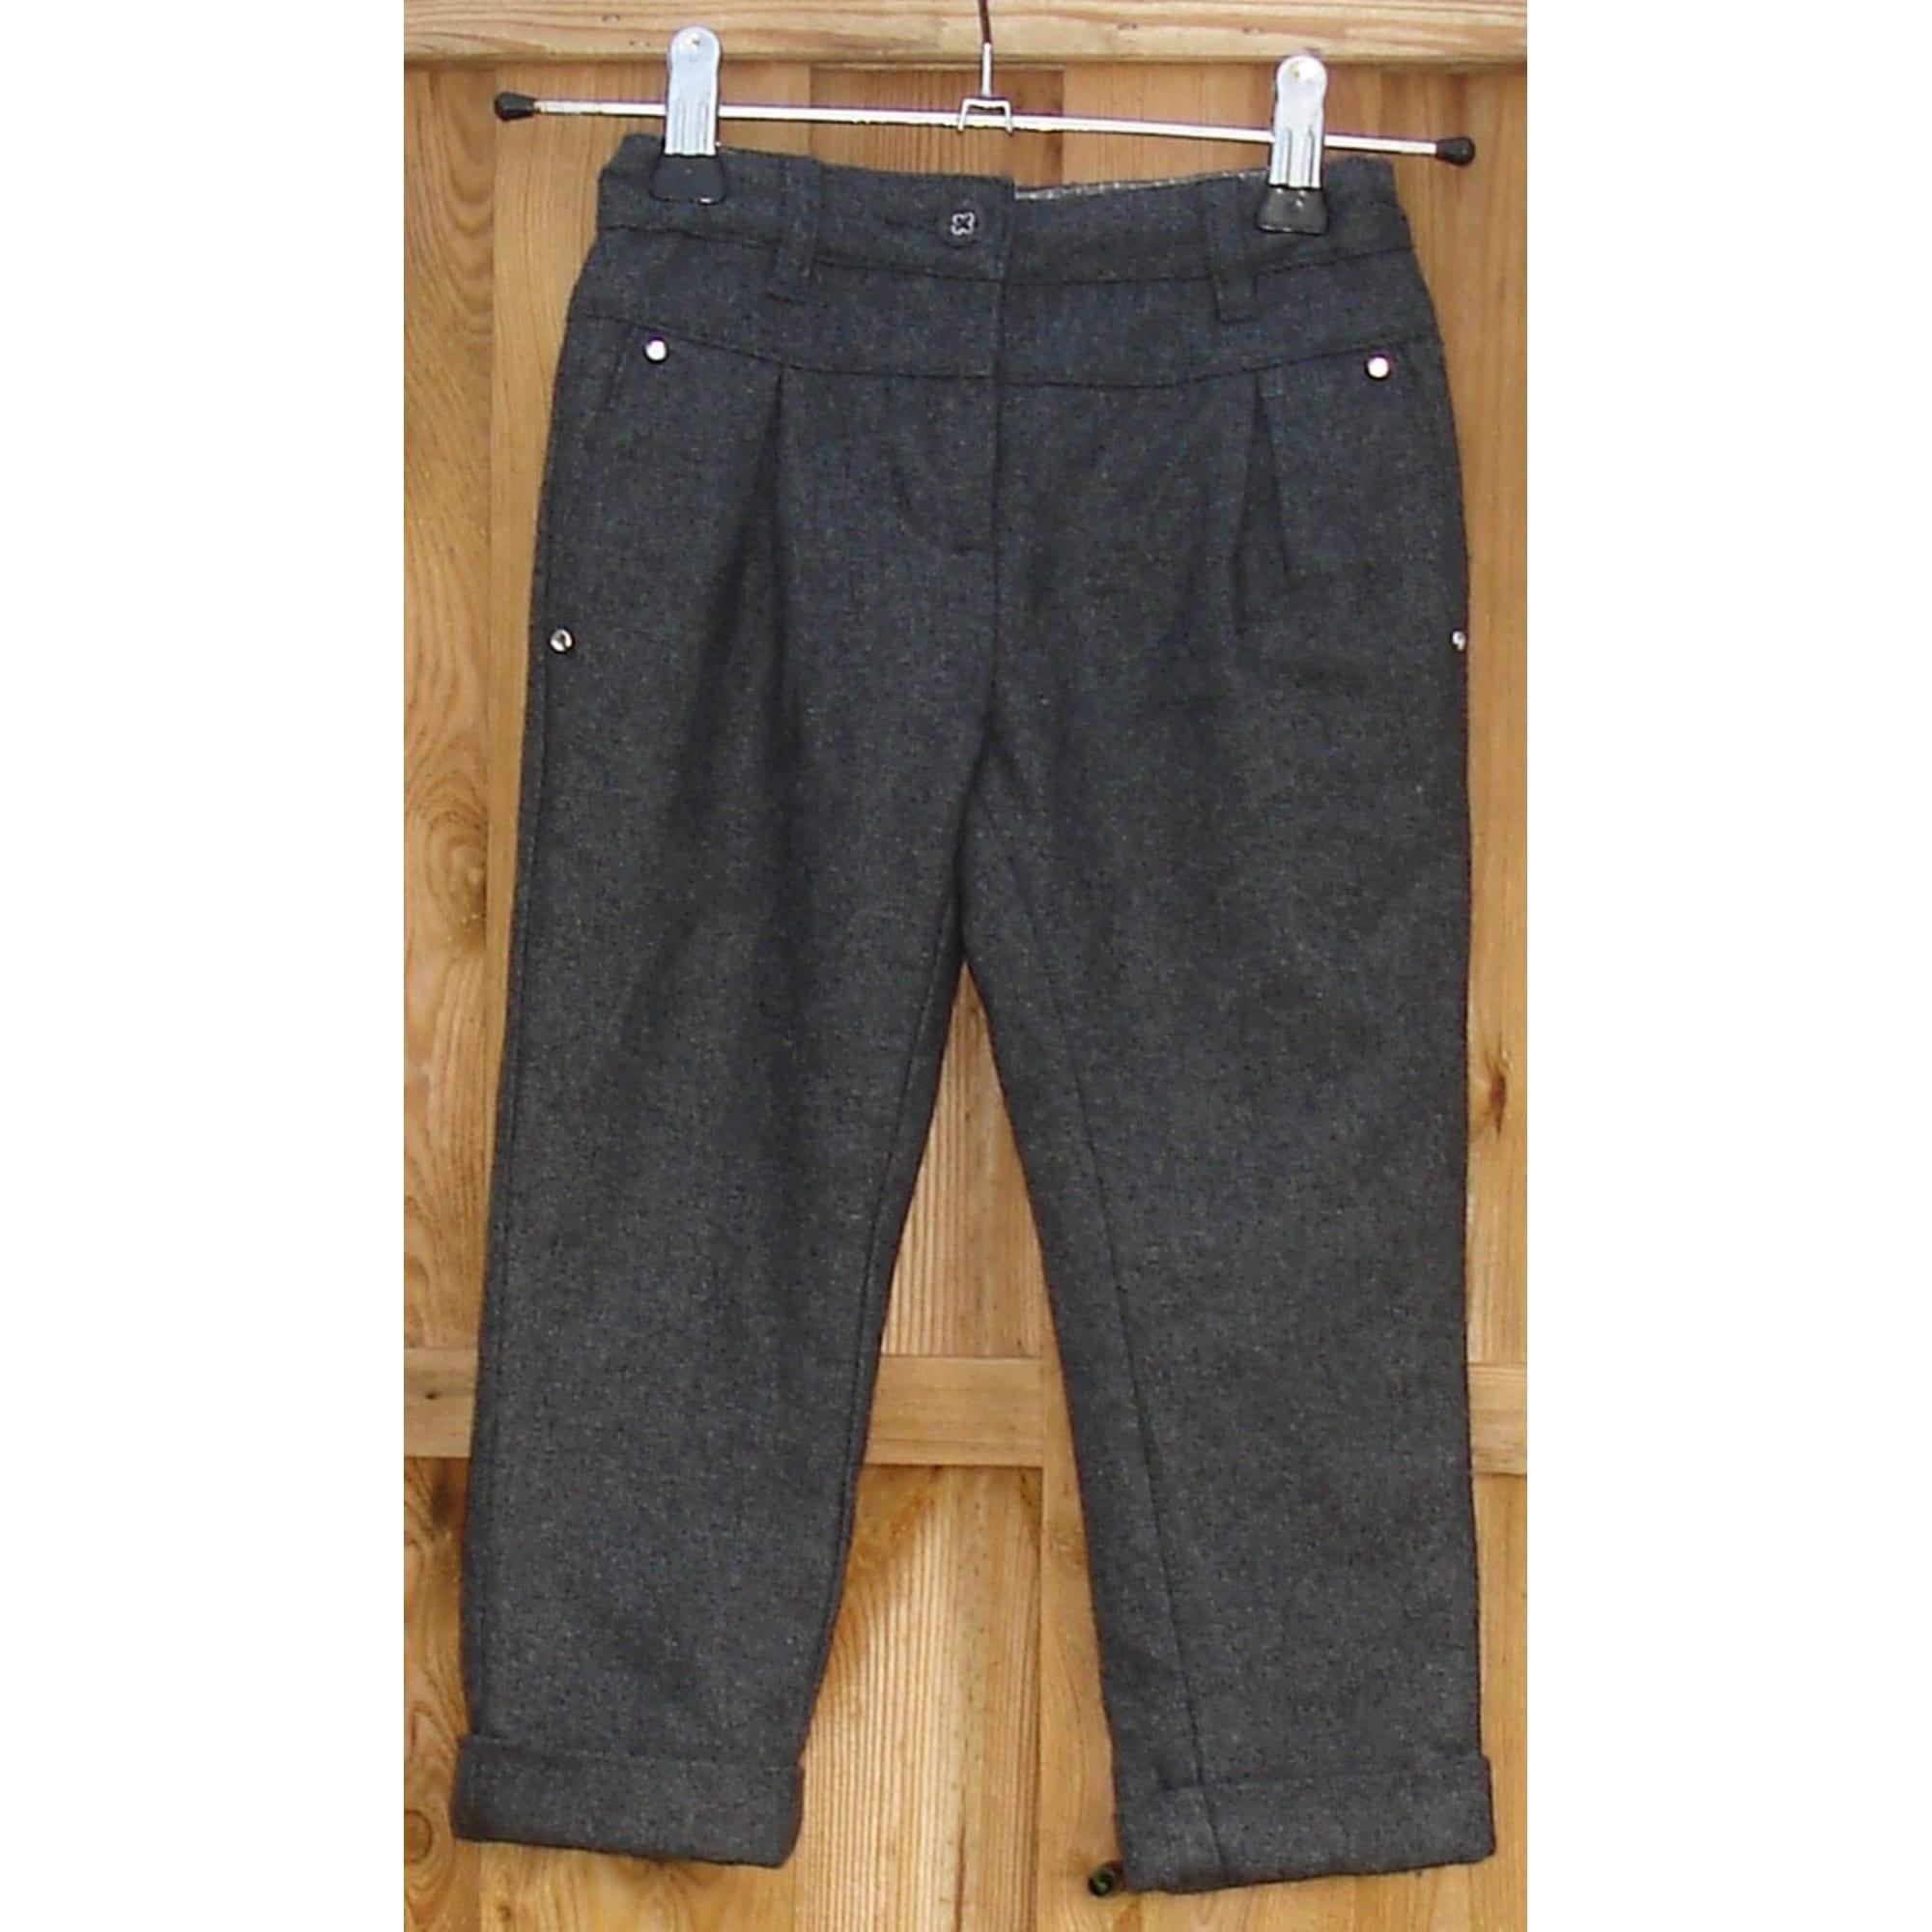 Pantalon CYRILLUS Gris, anthracite